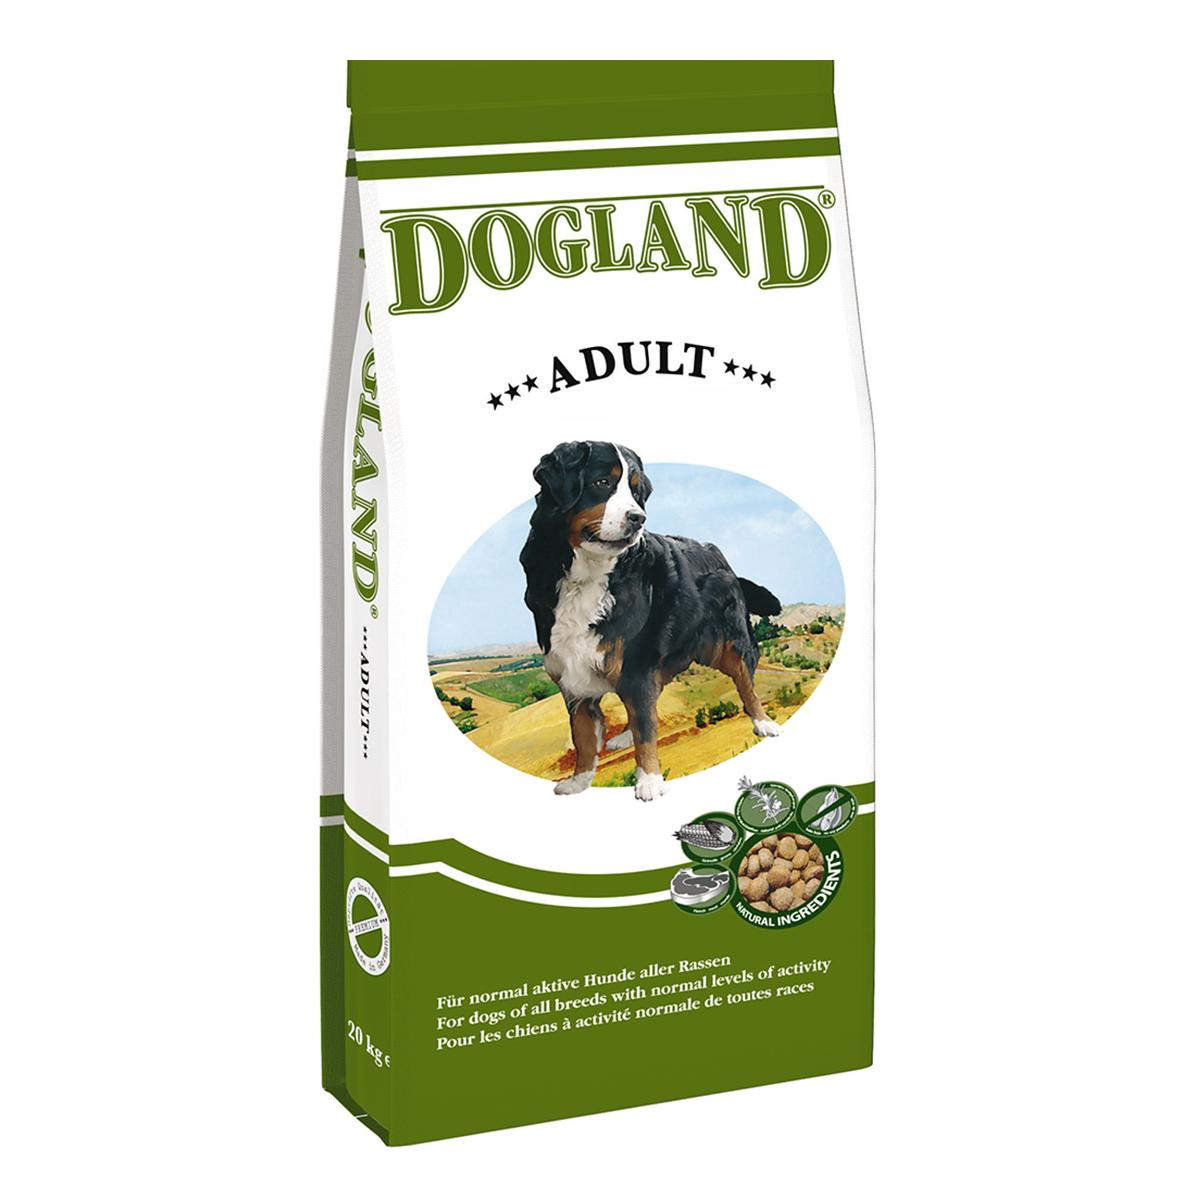 Dogland Dog Adult 15 kg imagine